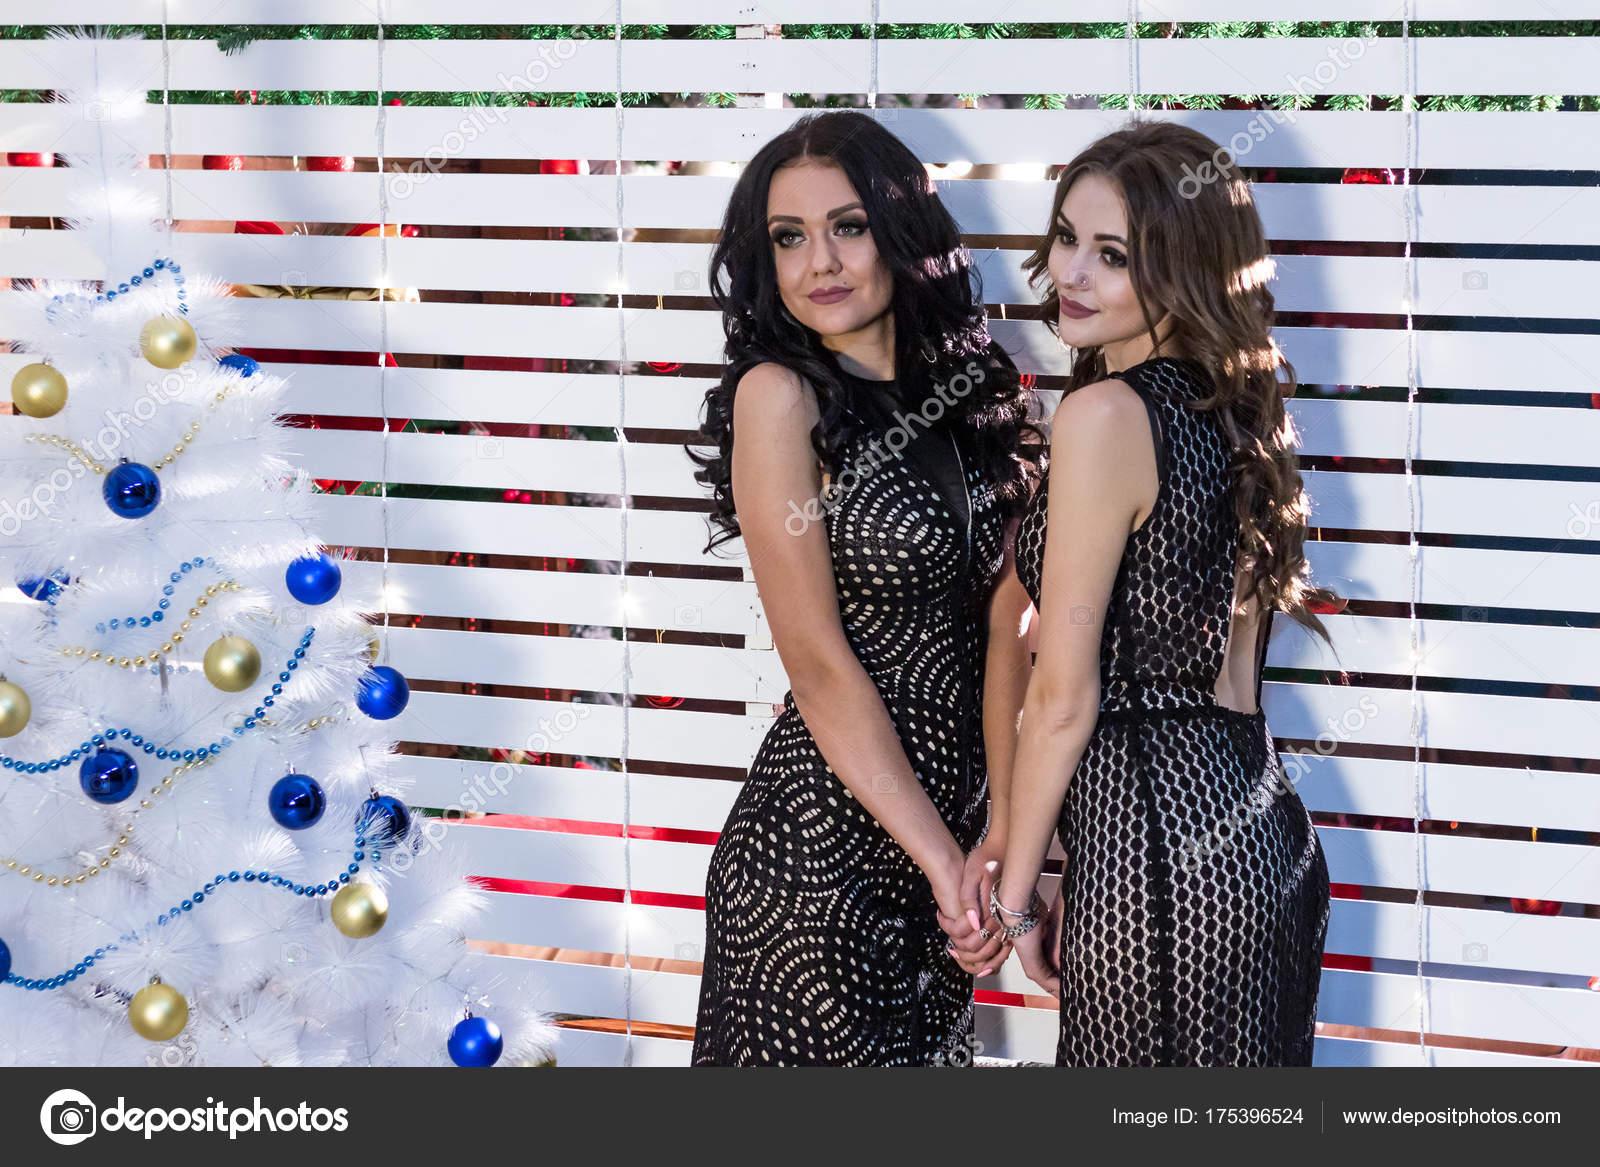 6658dda911f1 Δύο όμορφες νεαρές γυναίκες σε μαύρο βραδινά φορέματα μόνιμη κοντά ...